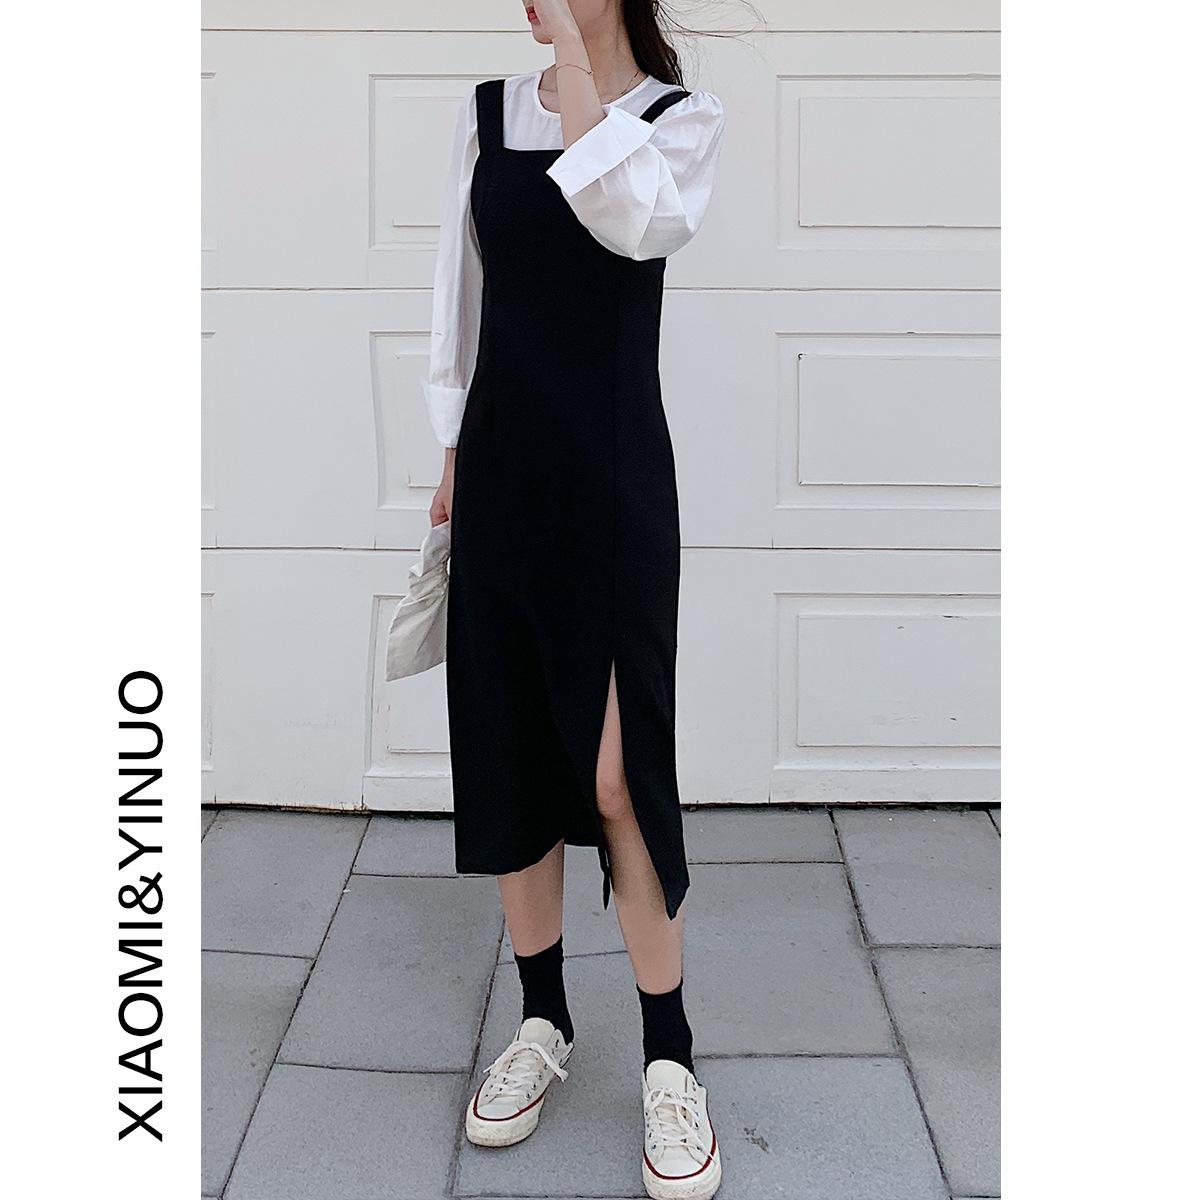 XIAOMIYINUO 7486 fashion skirt suit two-piece female 2020 autumn age reduction shirt top suspender d